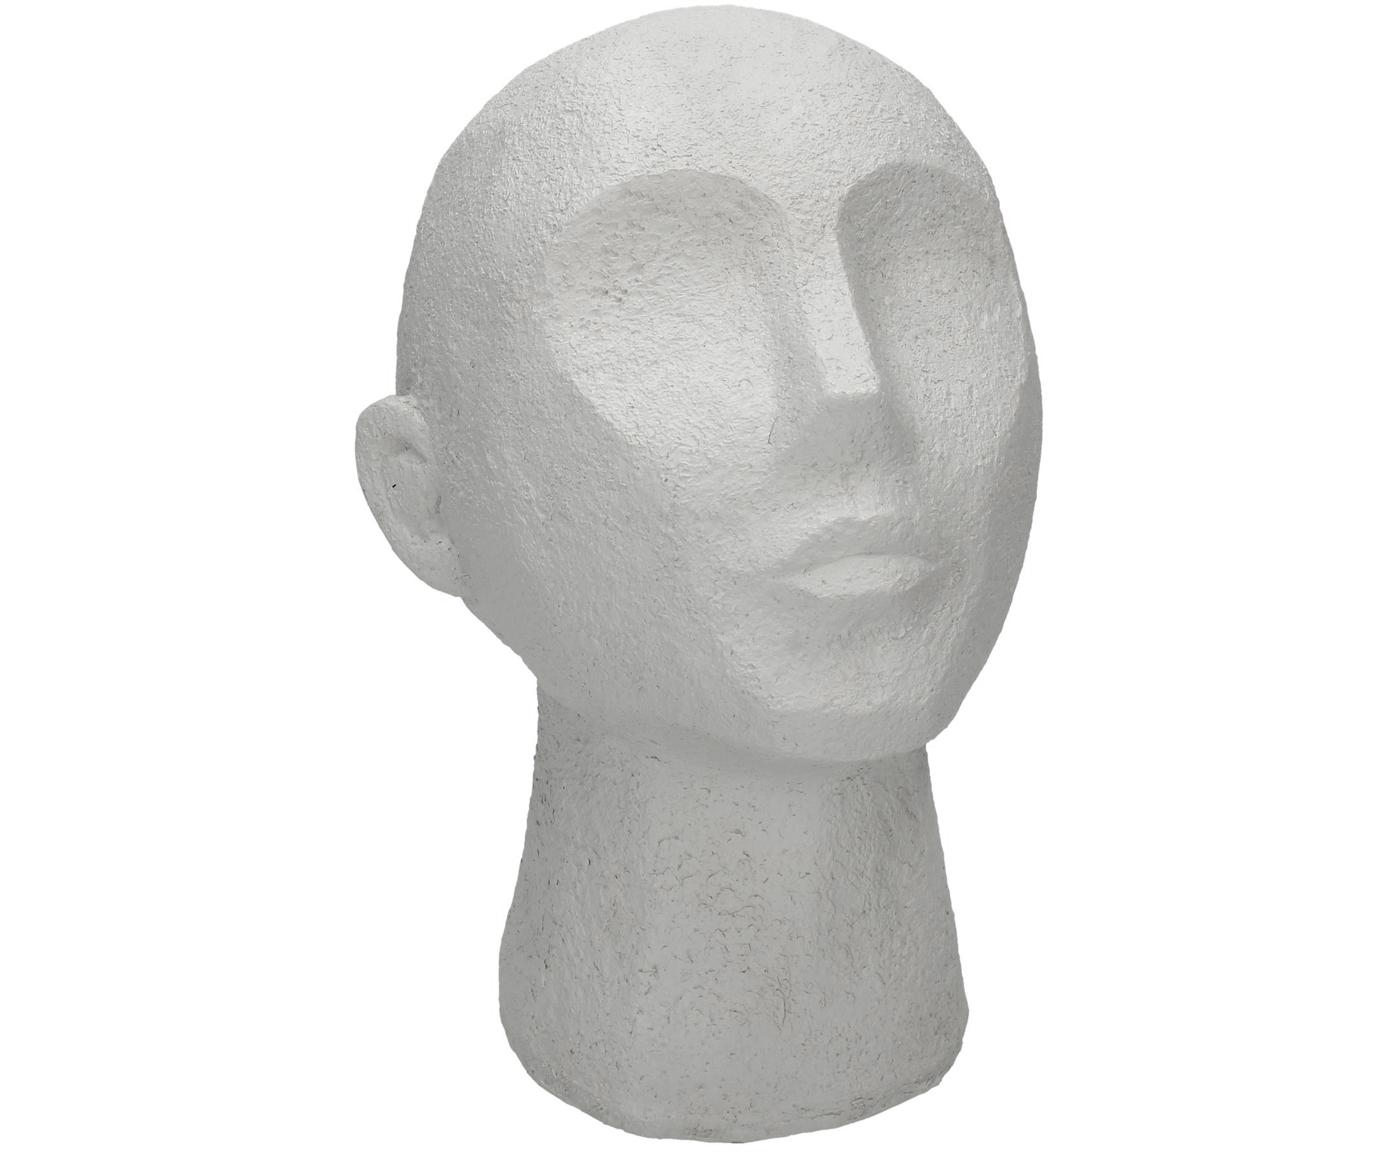 Deko-Objekt Head, Polyresin, Weiß, 19 x 23 cm